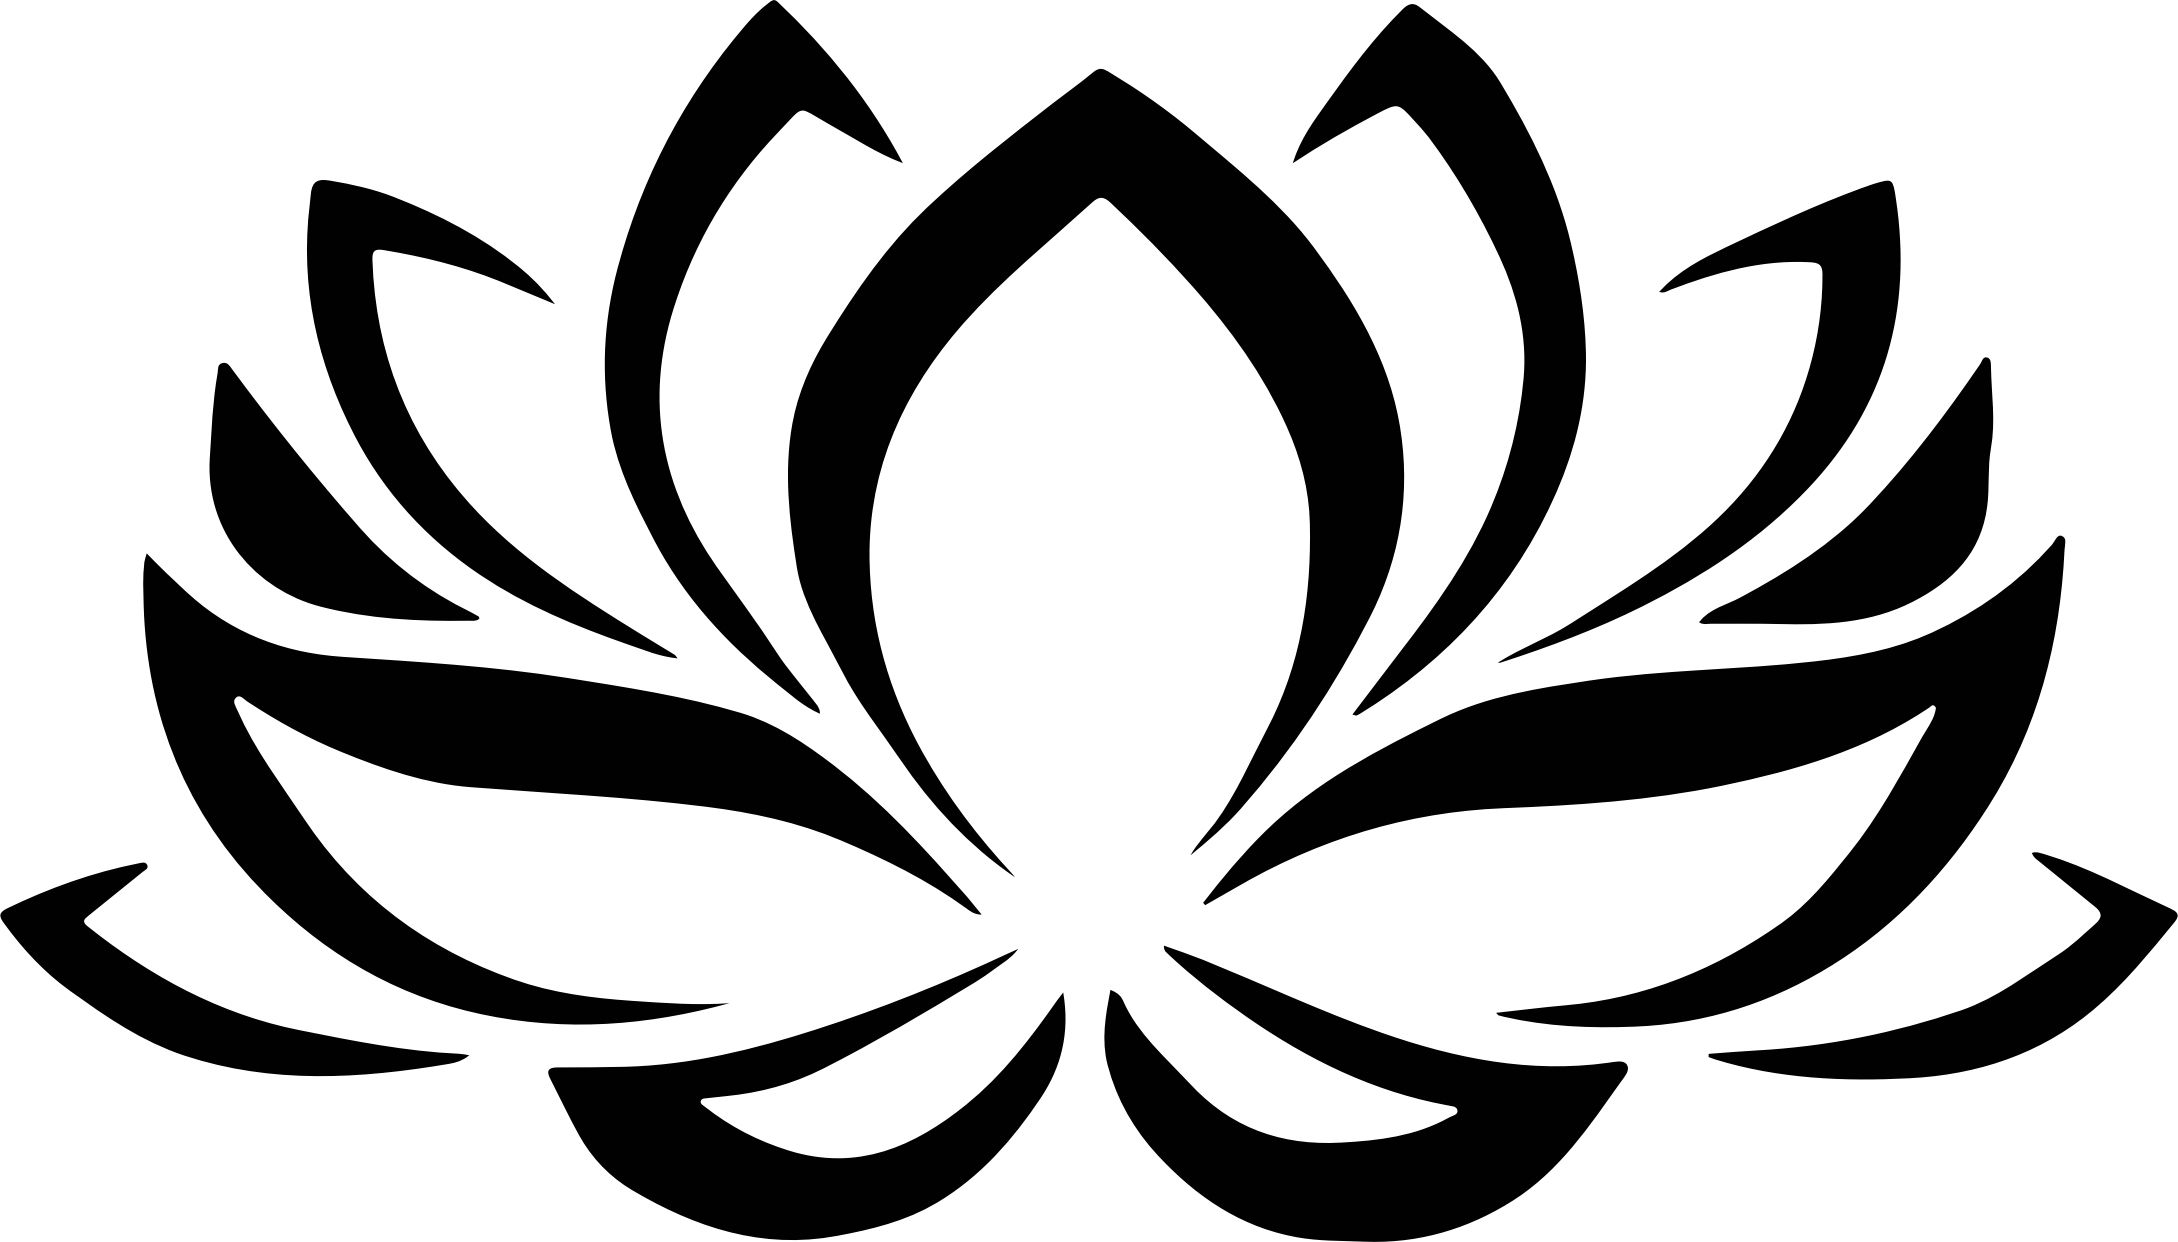 2178x1242 great ink ideas ink flower silhouette, lotus drawing, flower